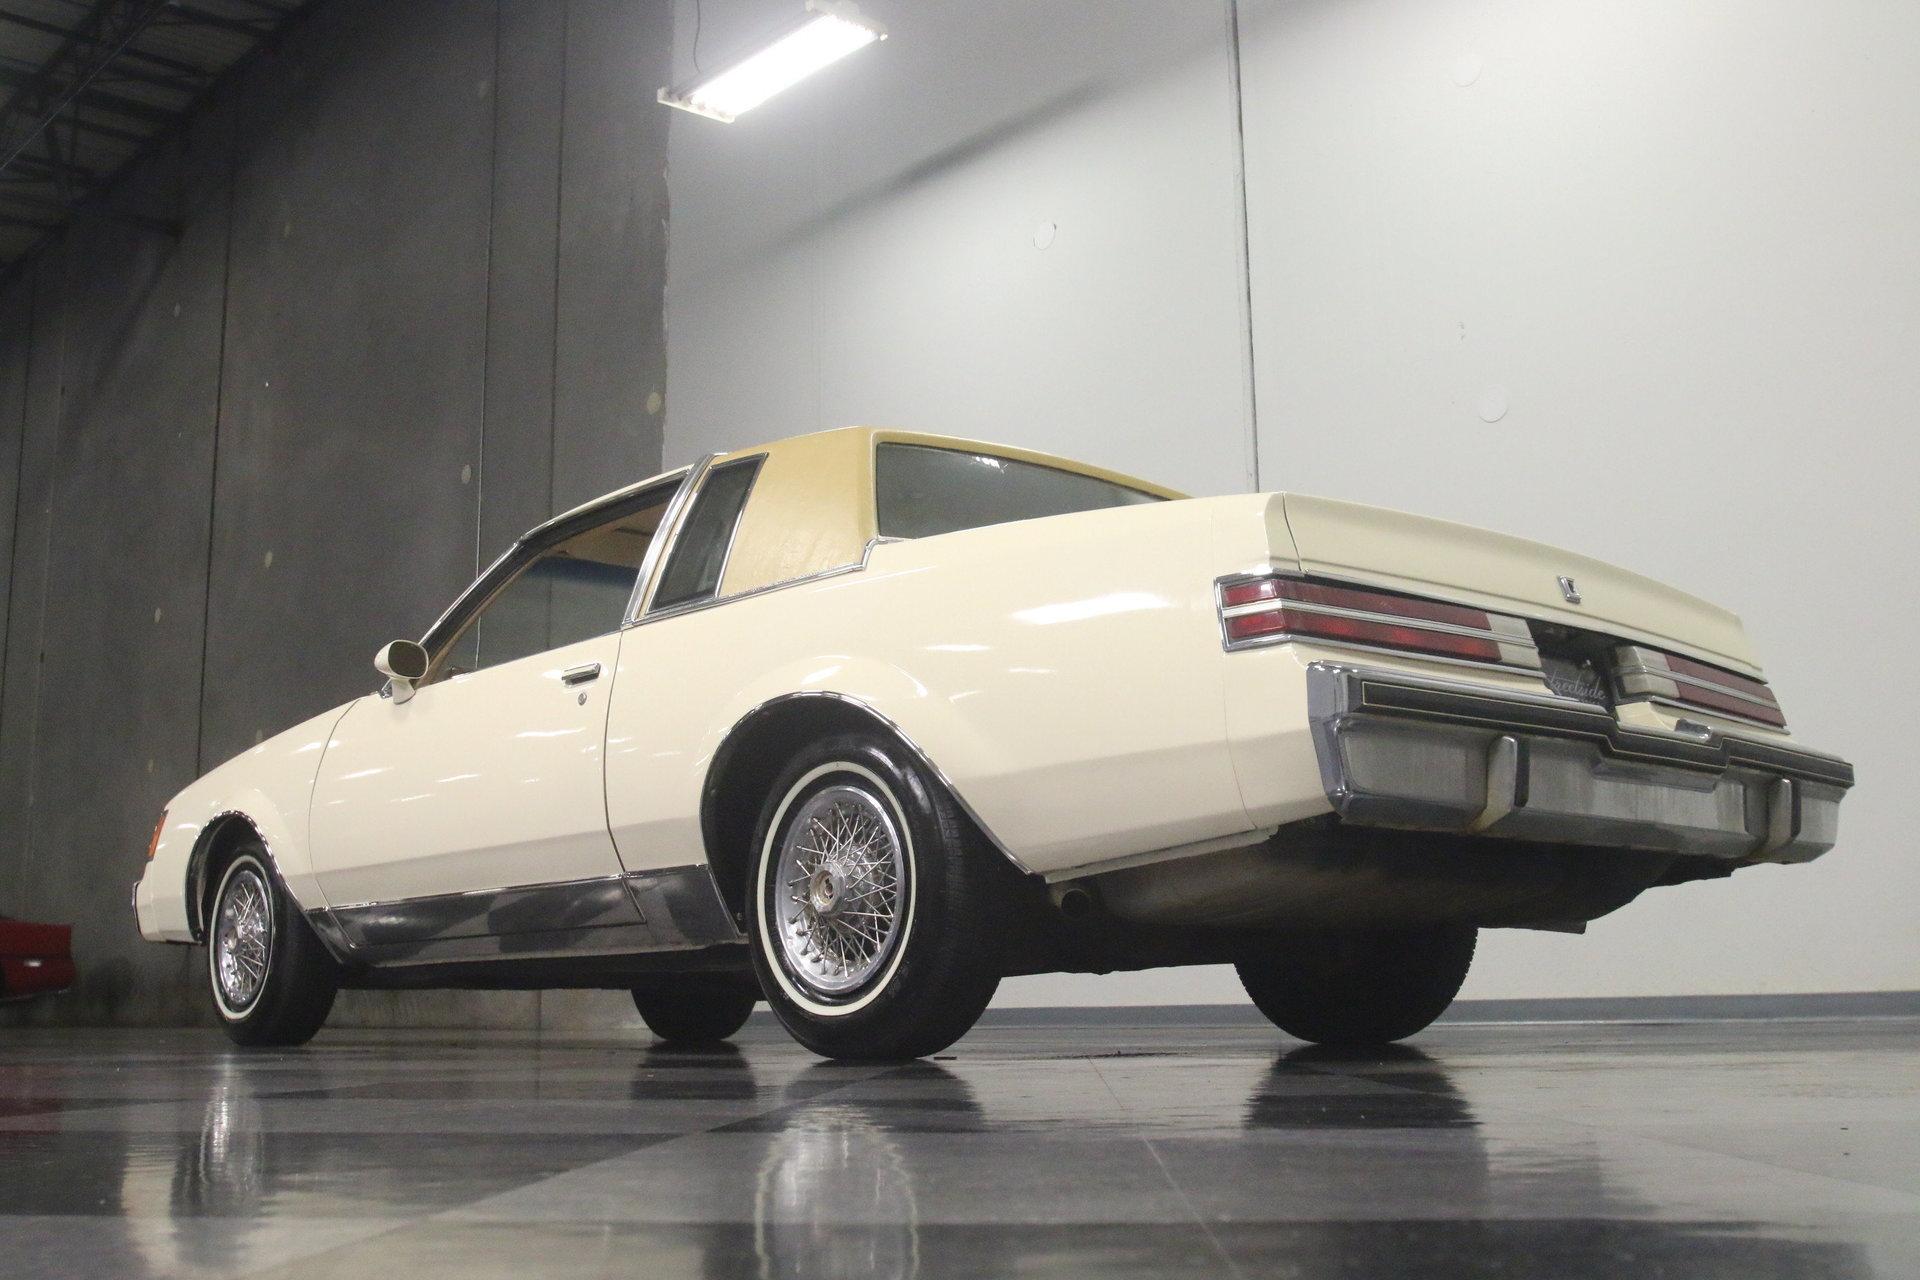 Phoenix Auto Sales >> 1985 Buick Regal   Streetside Classics - The Nation's Trusted Classic Car Consignment Dealer